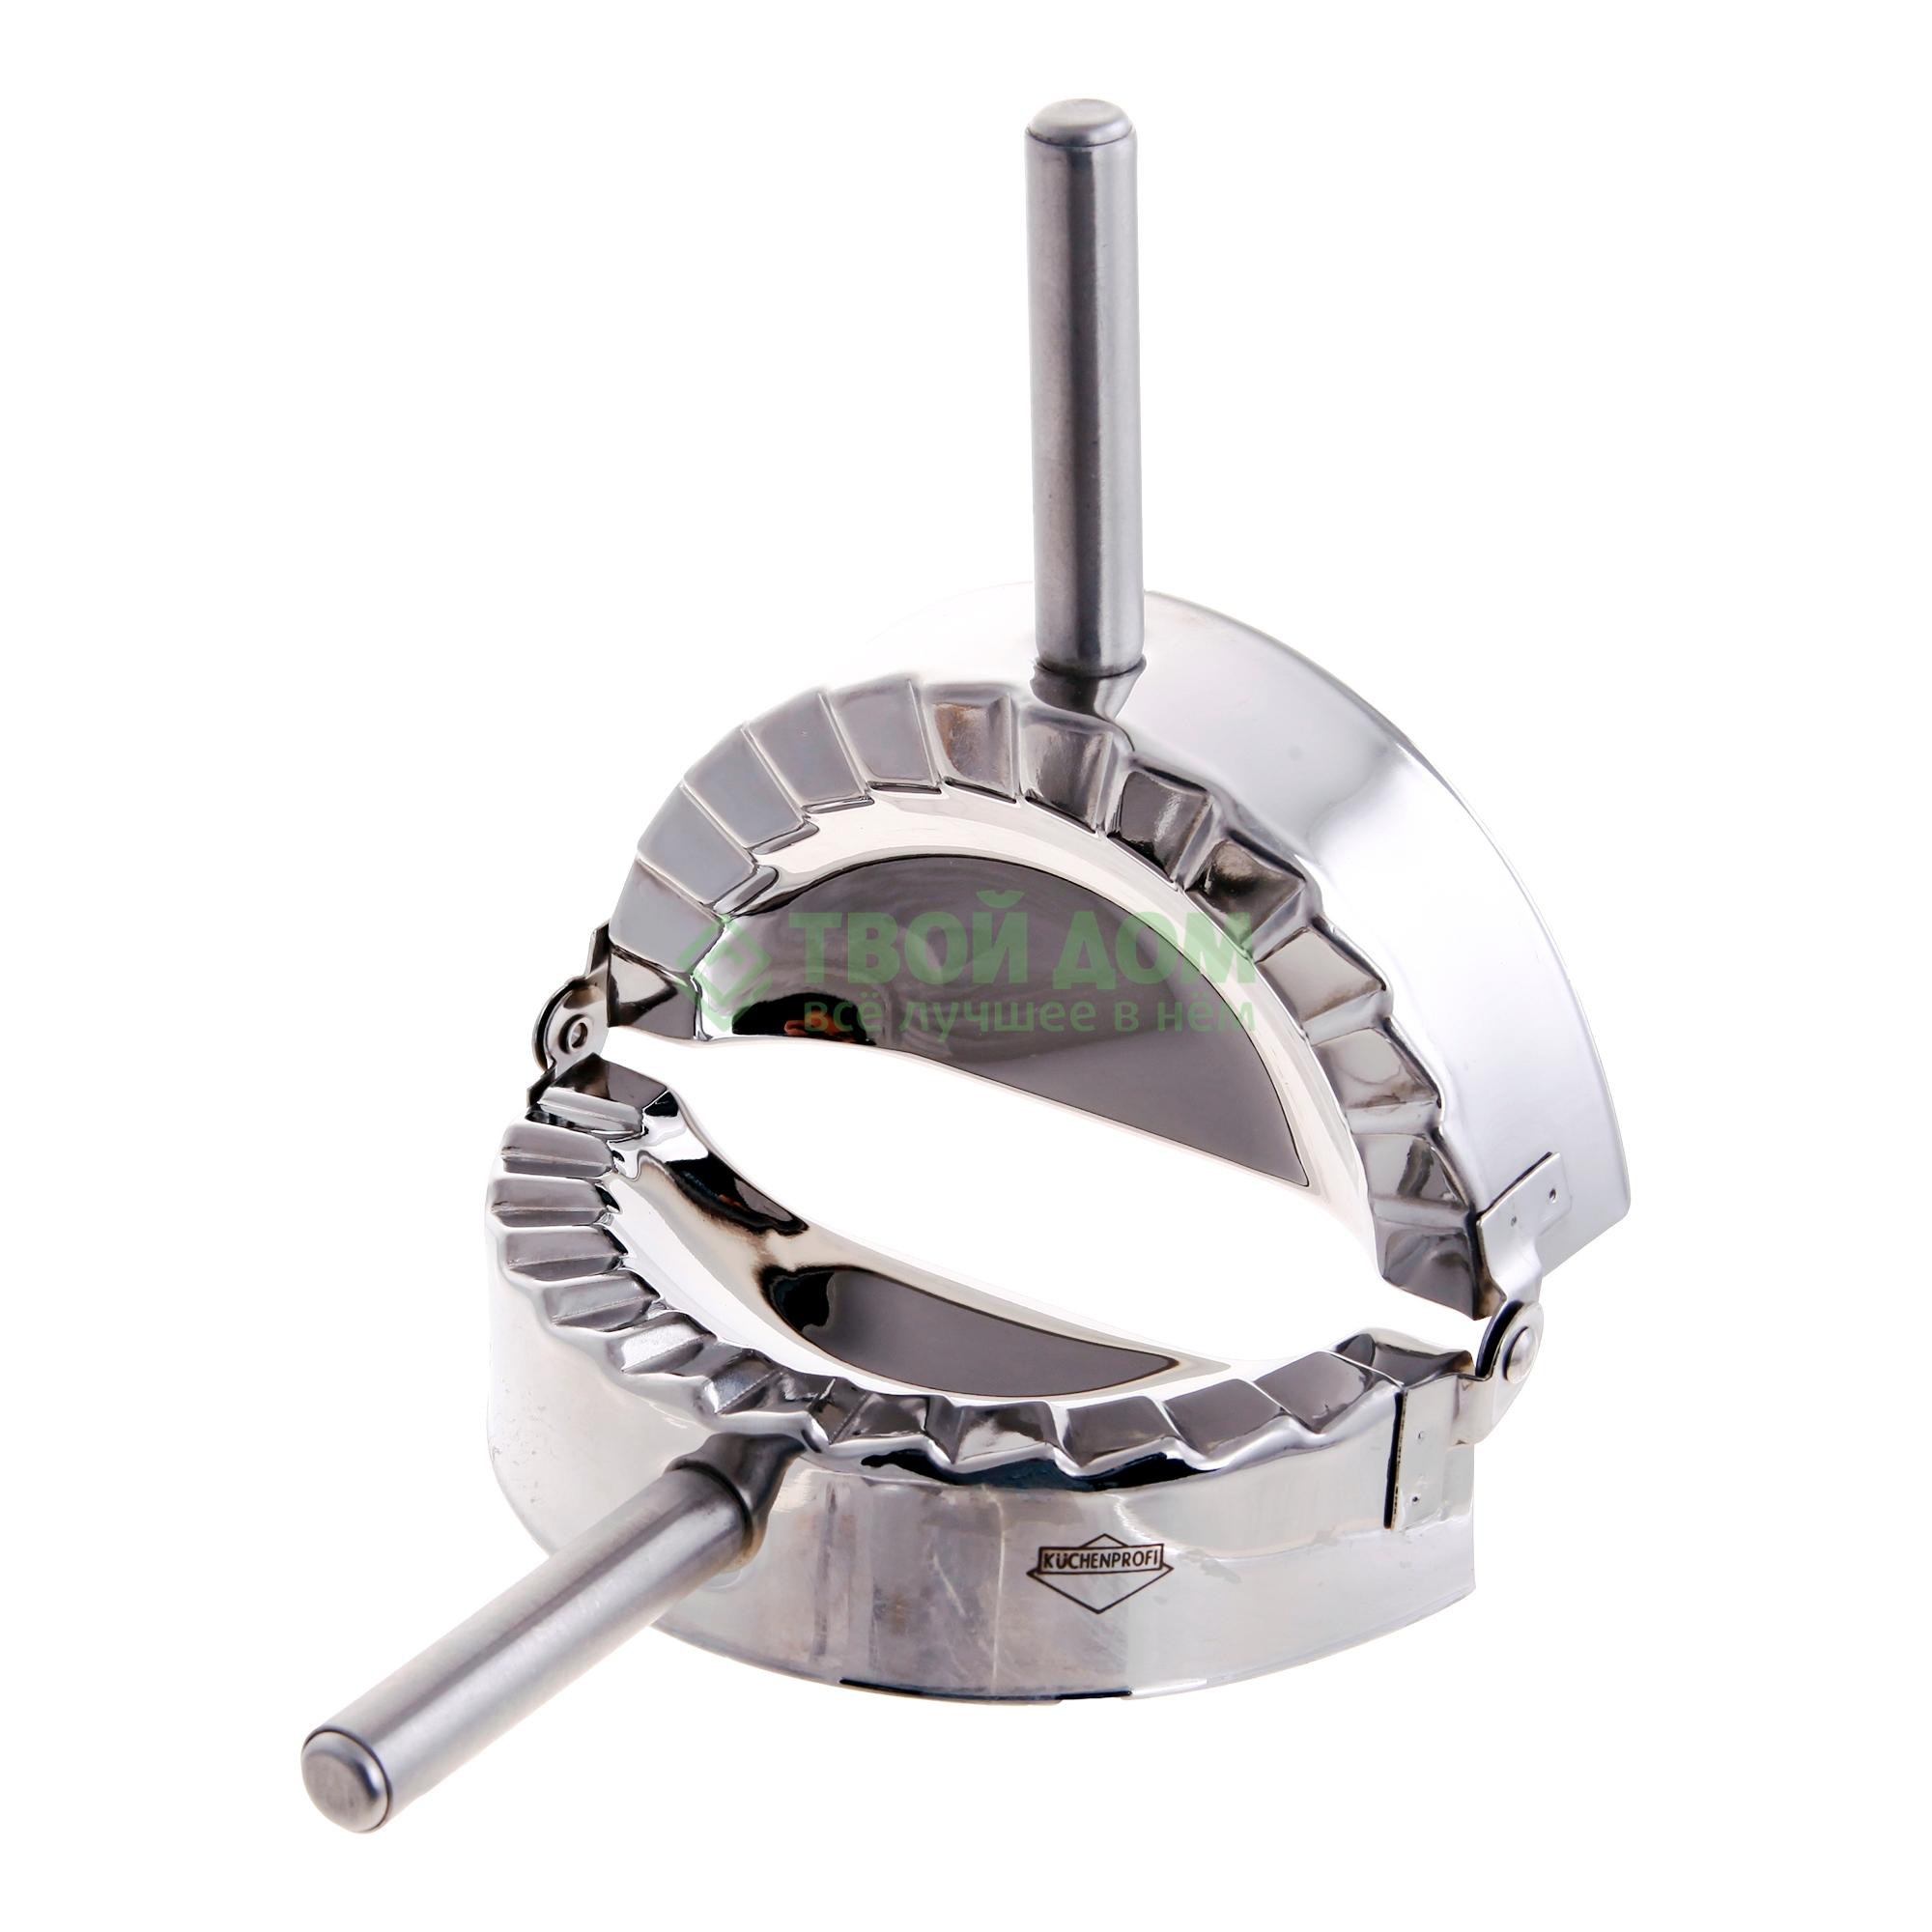 Форма для пельменей Kuchenprofi Форма для пельменей сталь 18/10 (08 0360 28 00) форма для пельменей kuchenprofi форма для пельменей сталь 18 10 08 0360 28 00